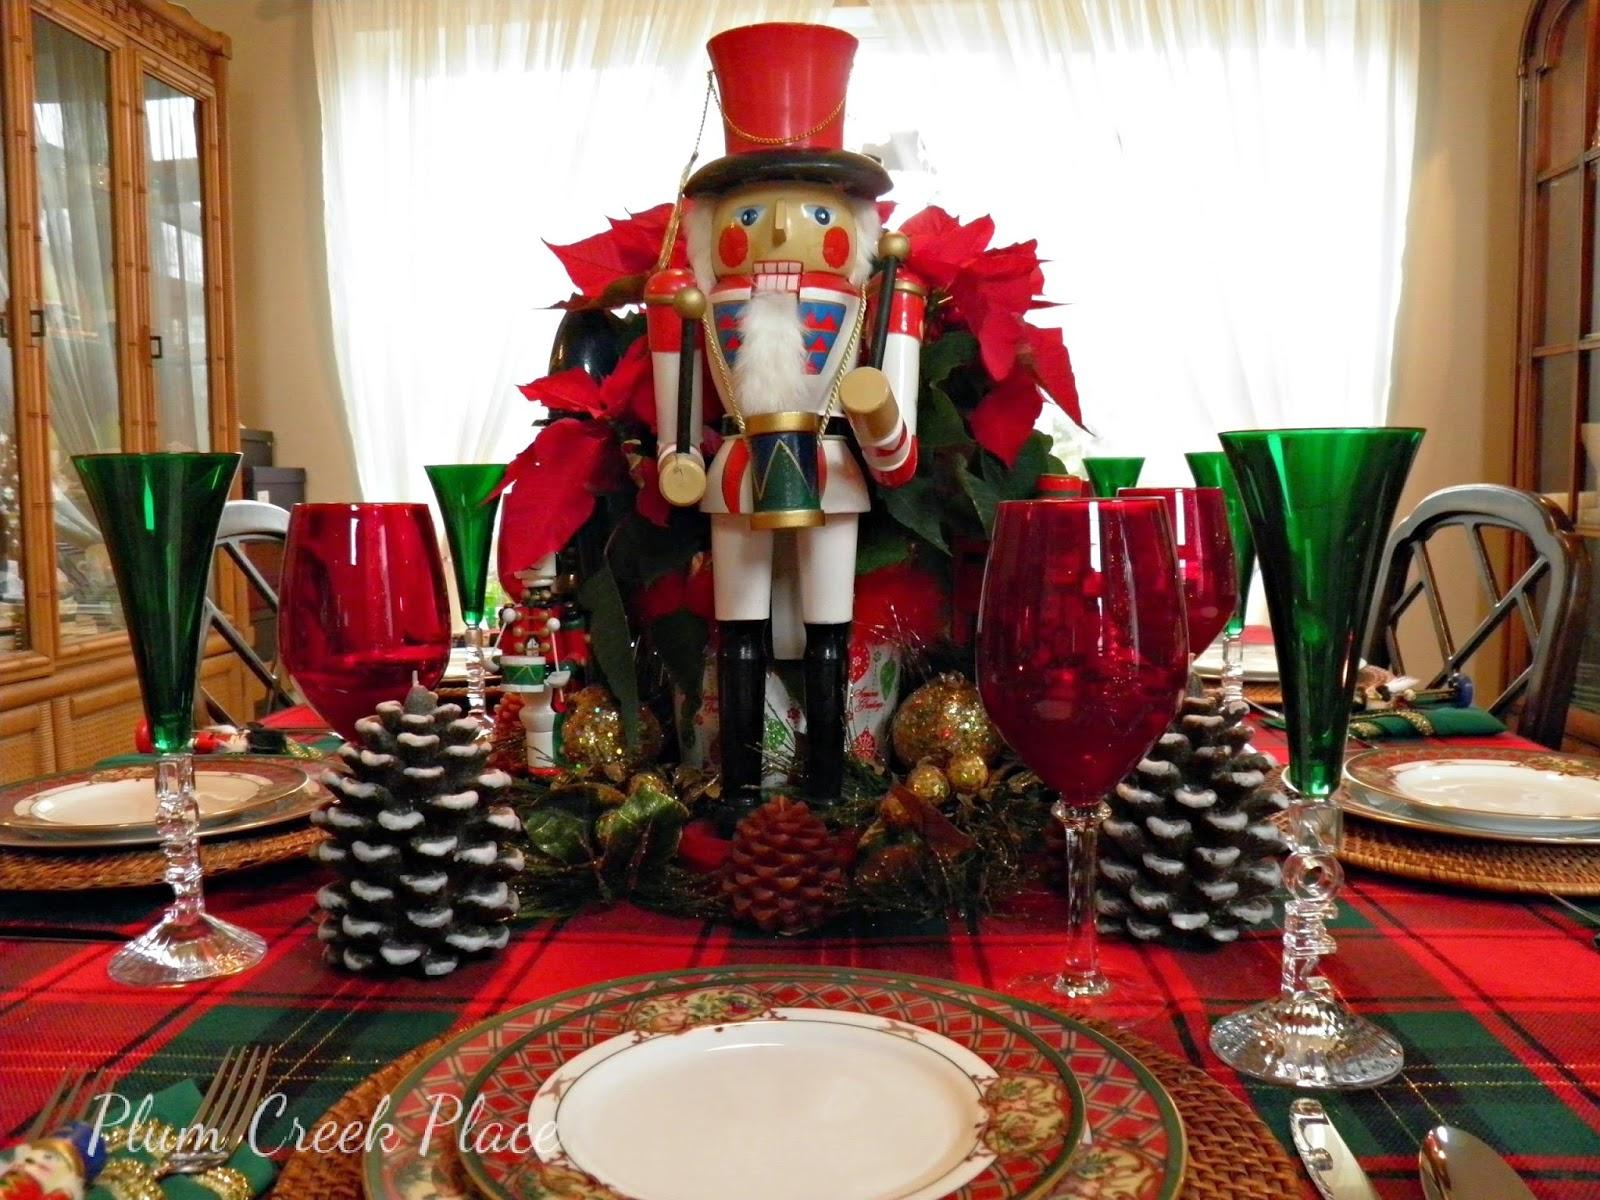 Nutcracker tablescape, Noritaki Royal Hunt, Noel wine flutes, poinsettias, pine cones